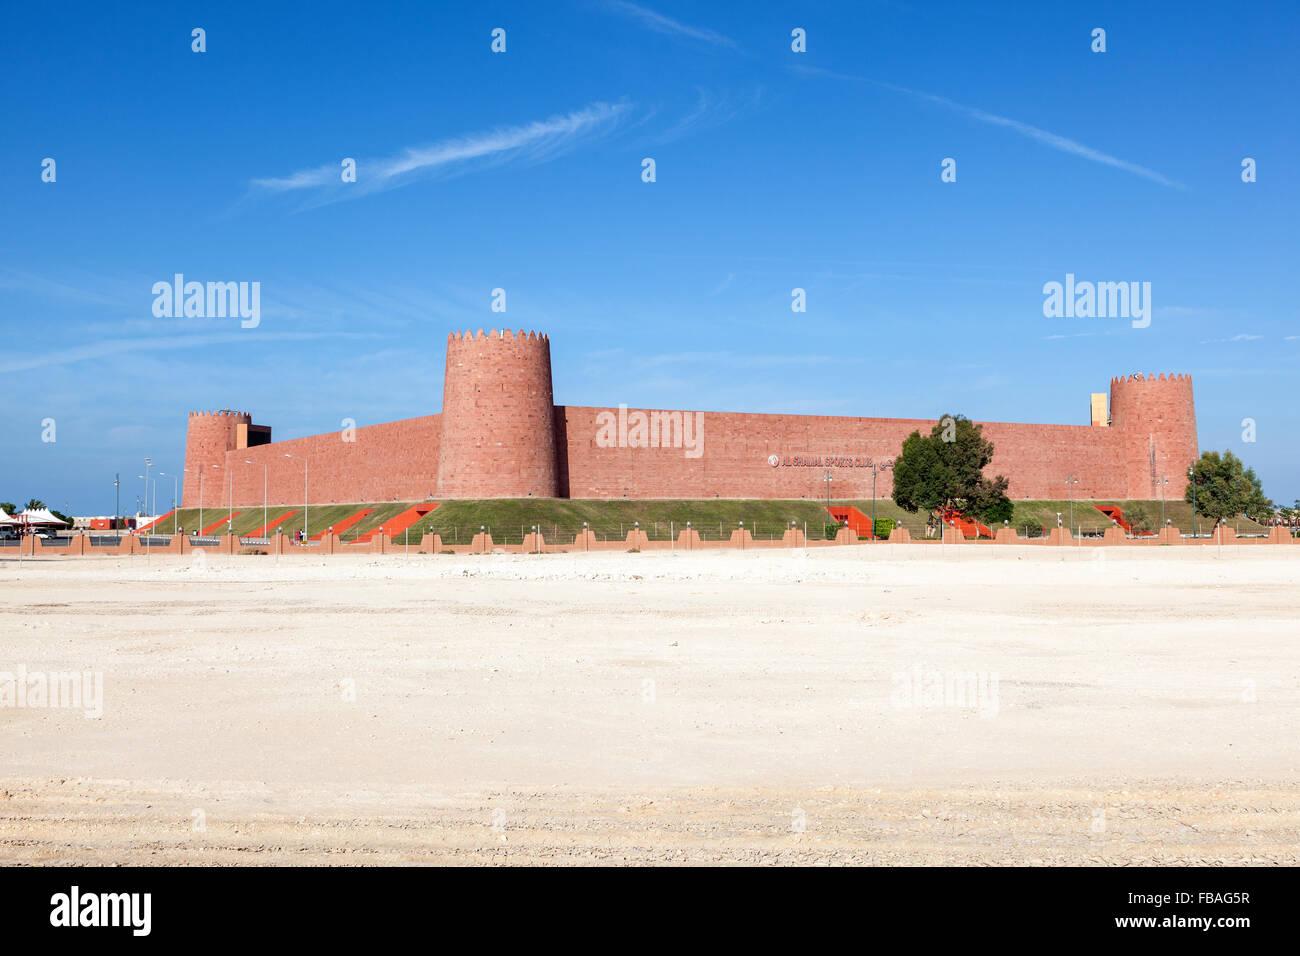 New Al Shamal Sports Club stadium in Al Ruwais - Stock Image